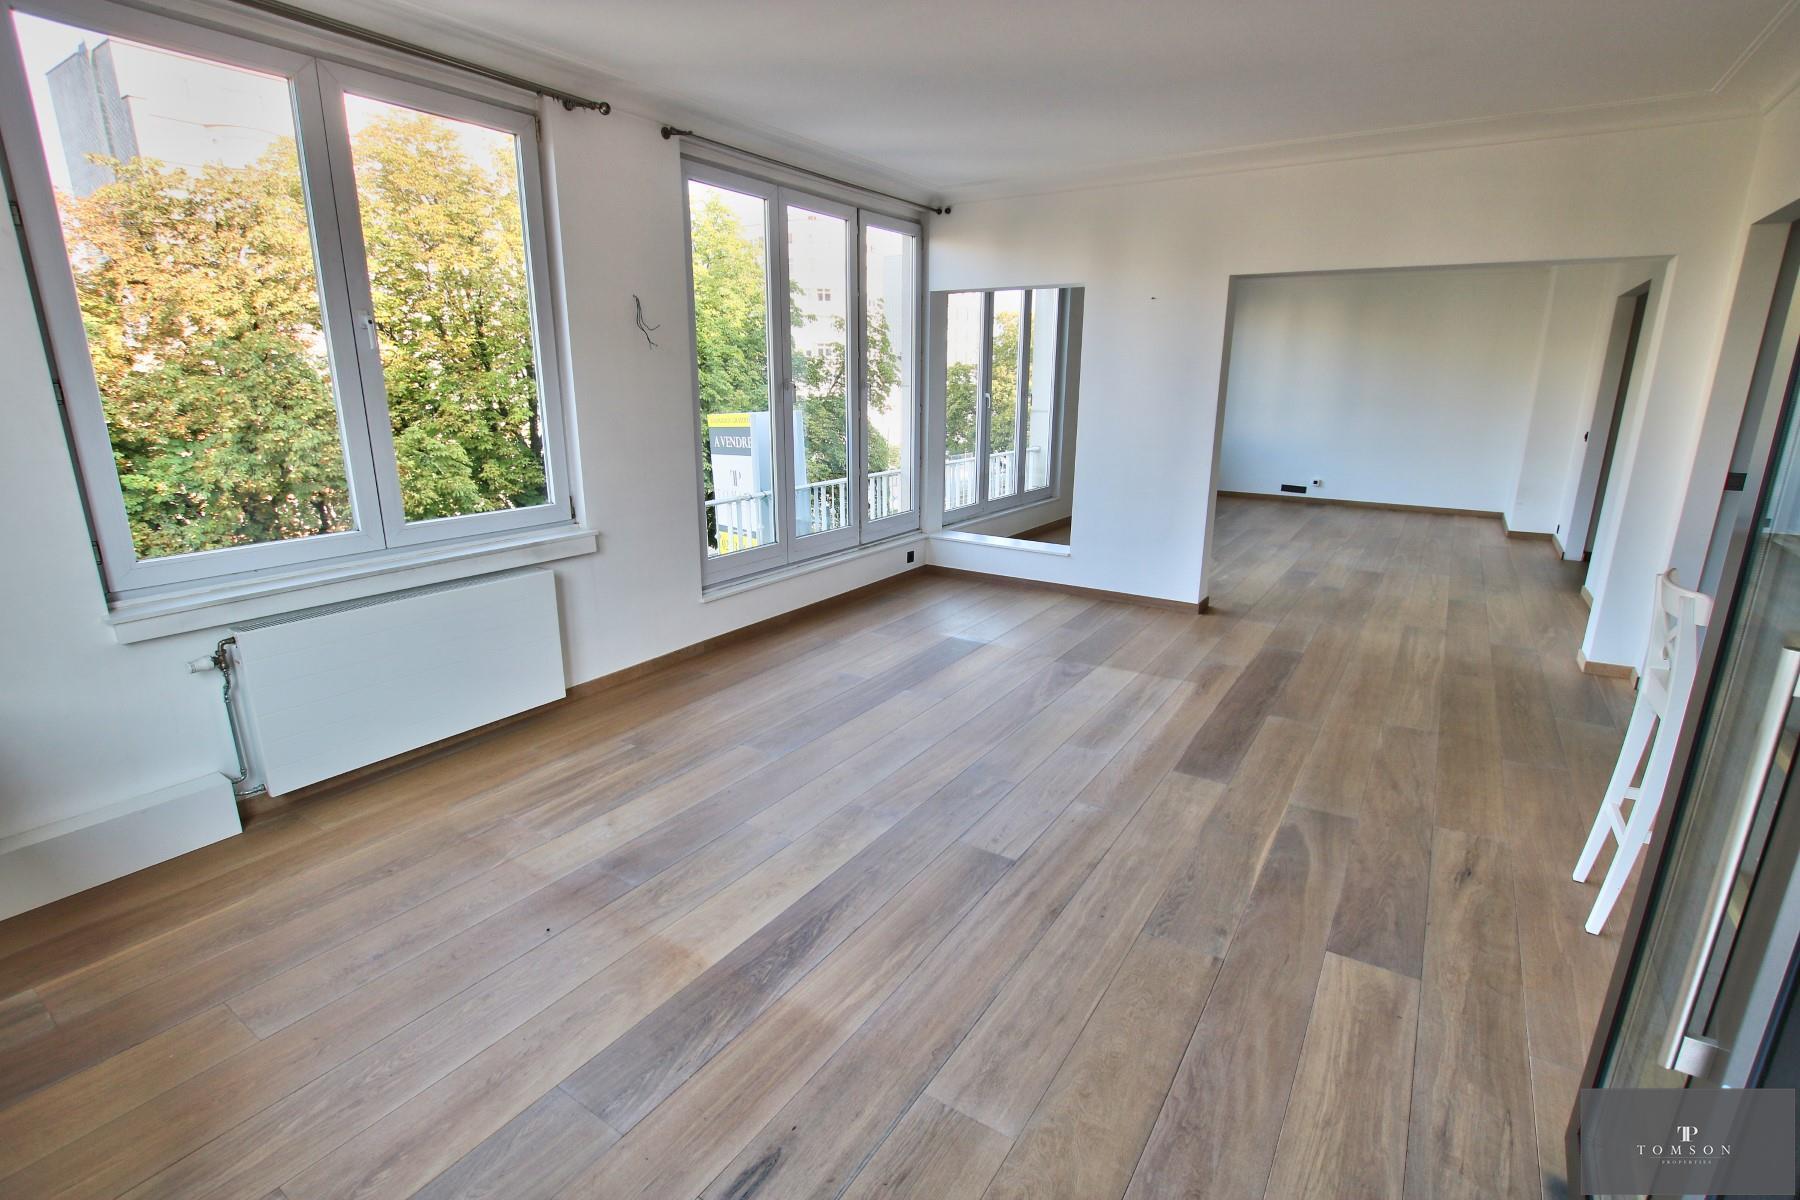 Flat - Etterbeek - #4154759-1